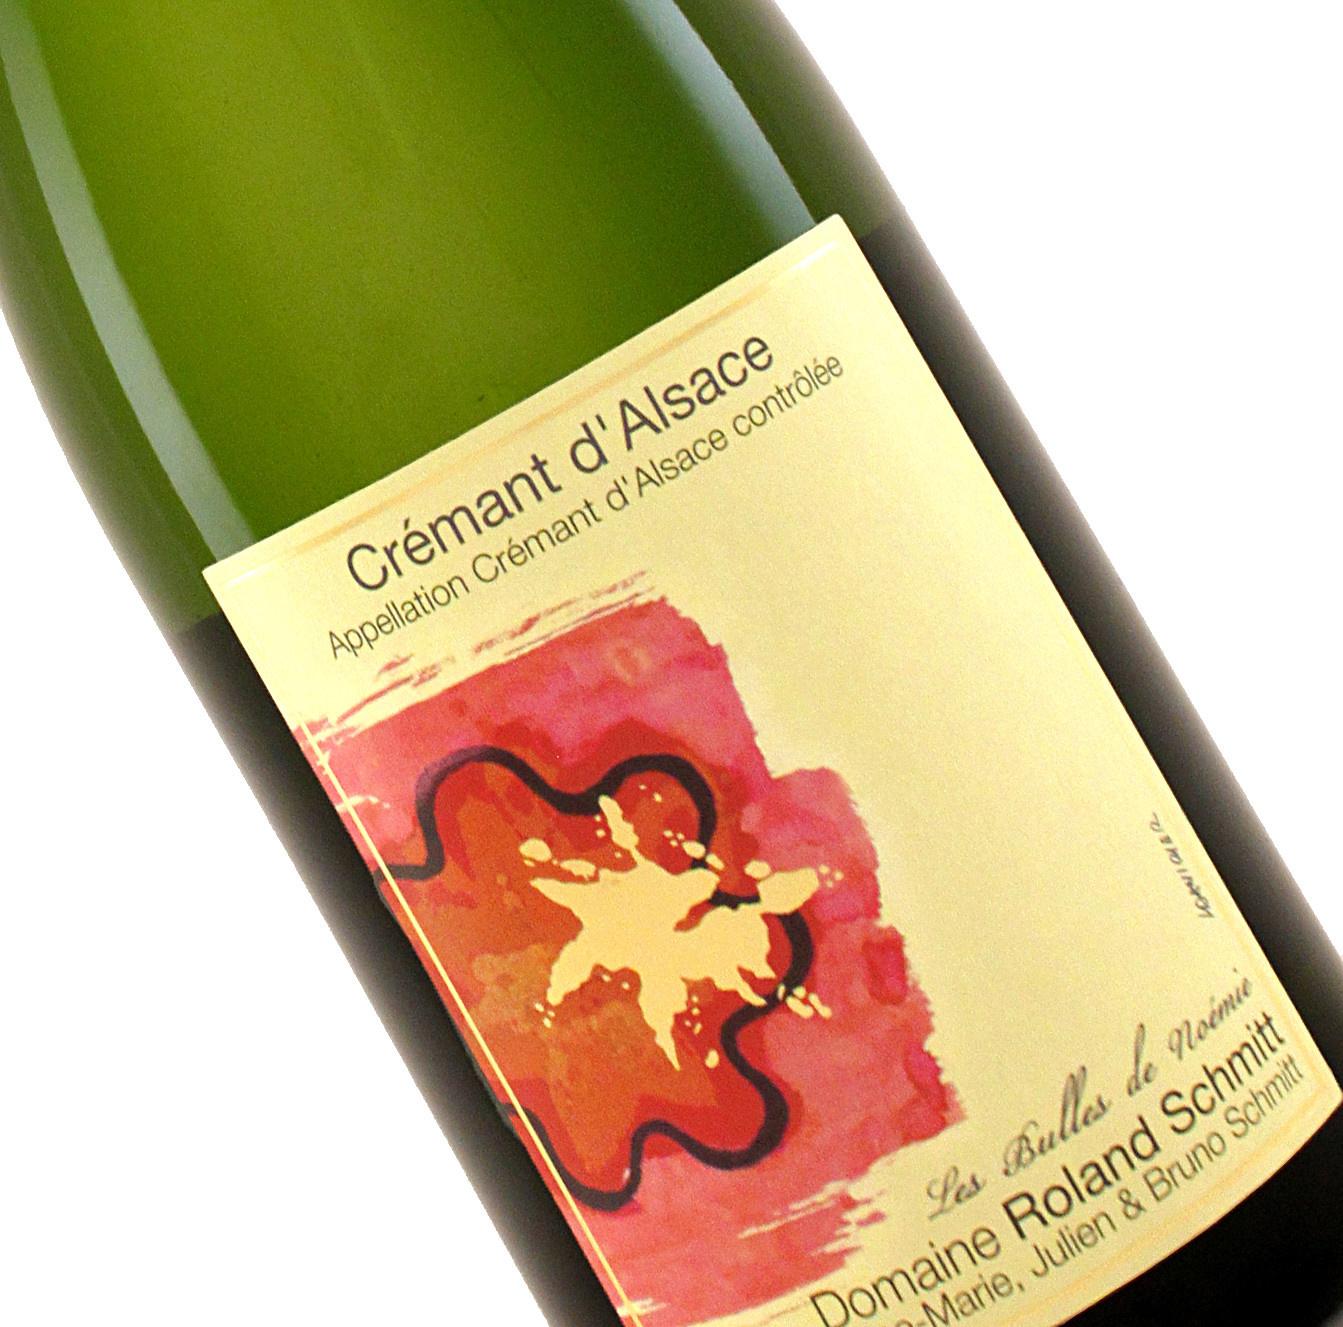 Domaine Roland Schmitt NV Cremant d'Alsace Sparkling Wine, Alsace